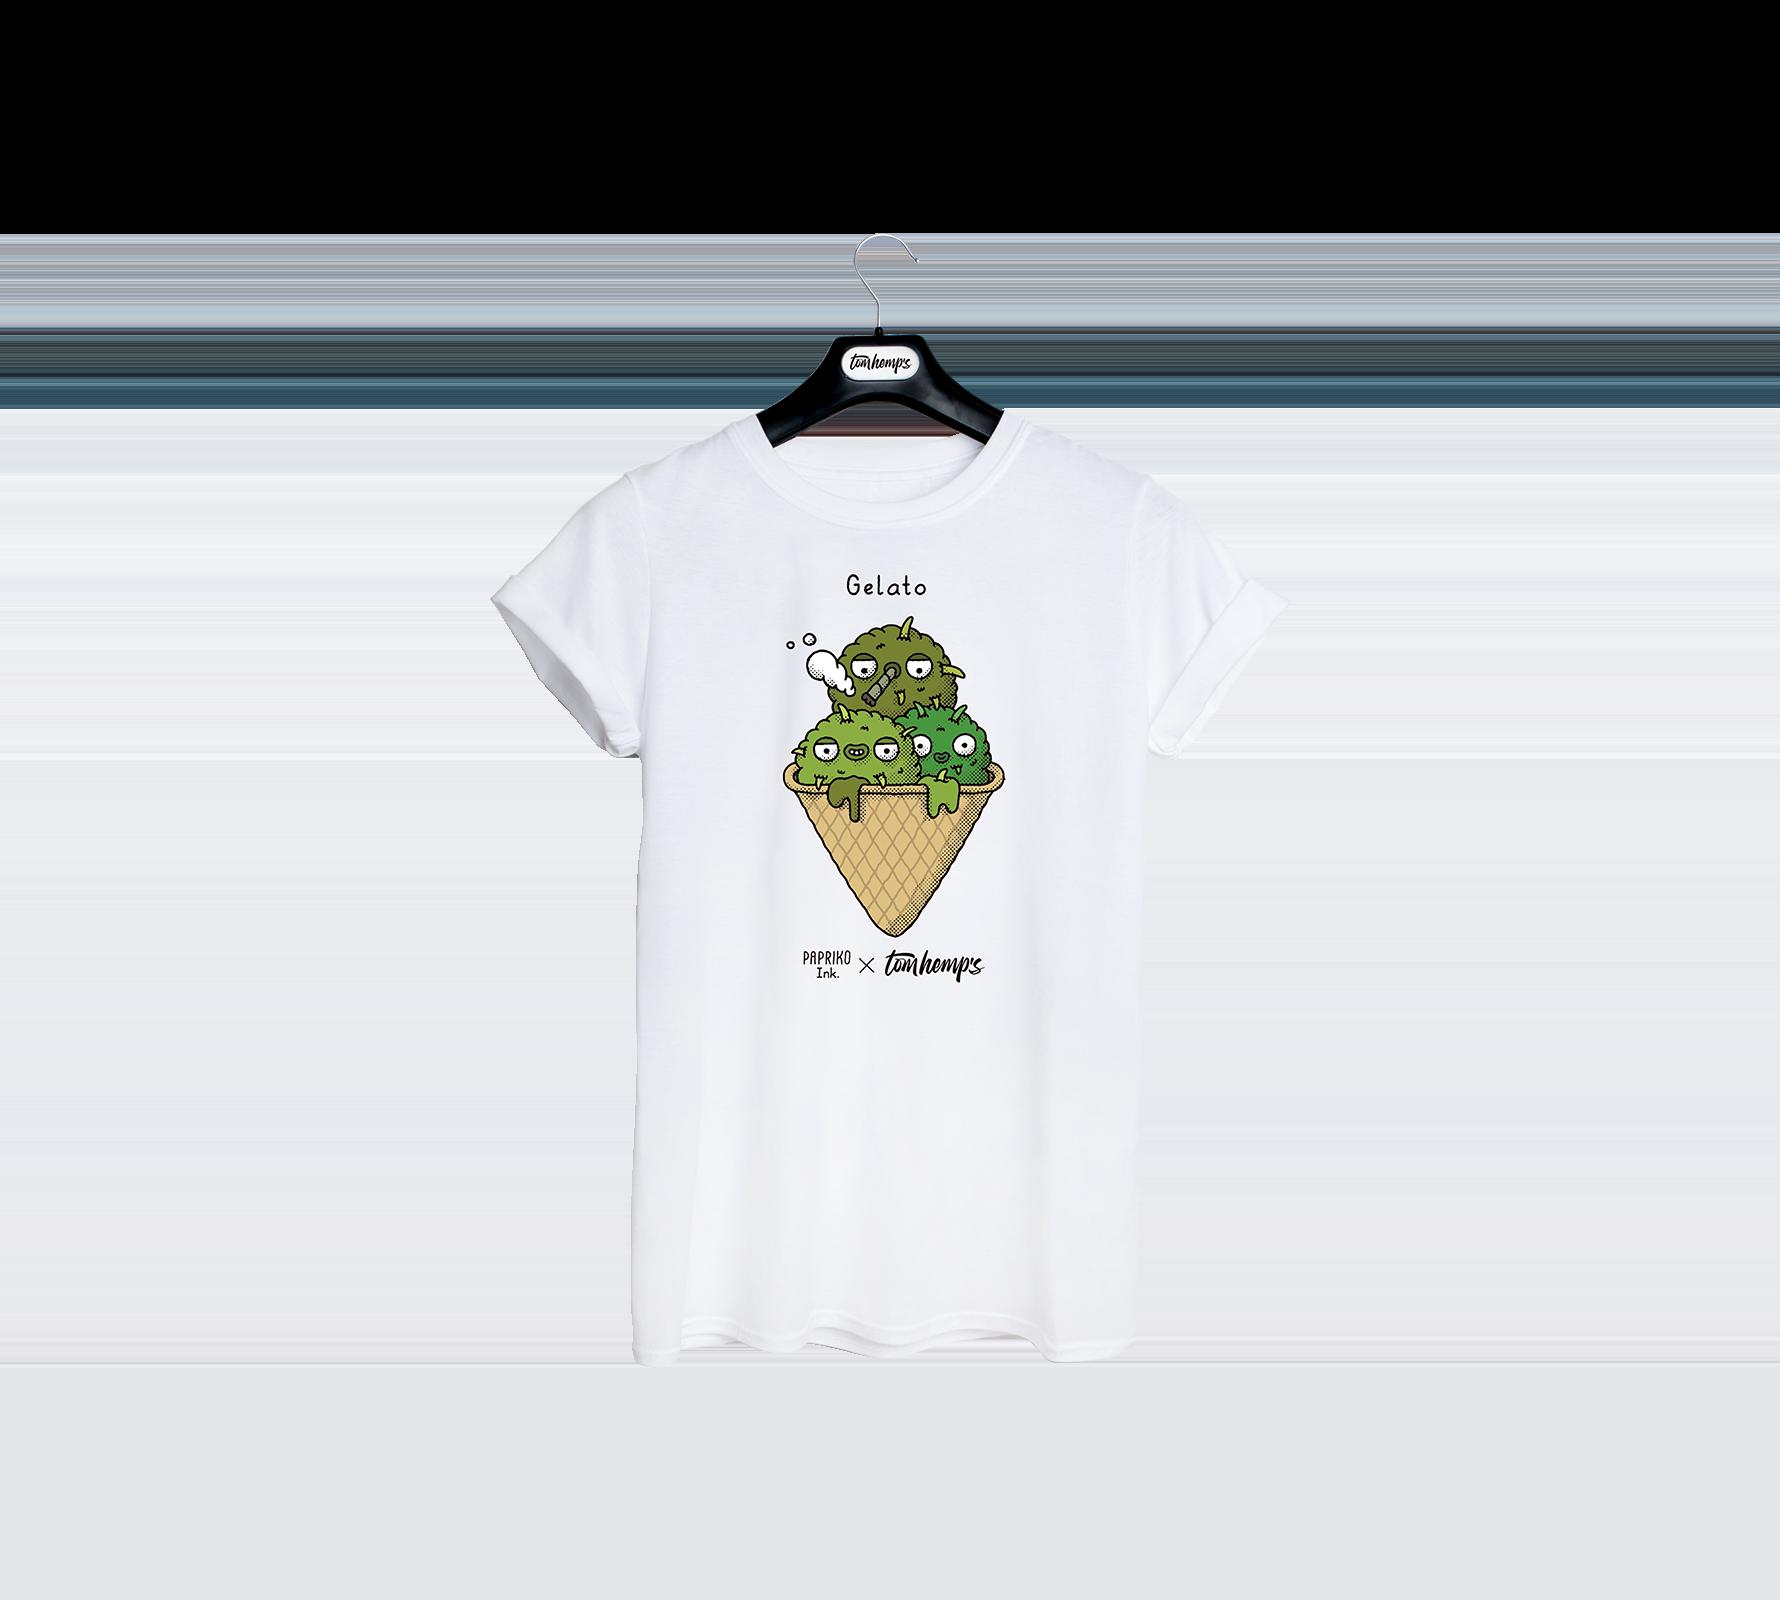 T-Shirt Papriko ink Gelato